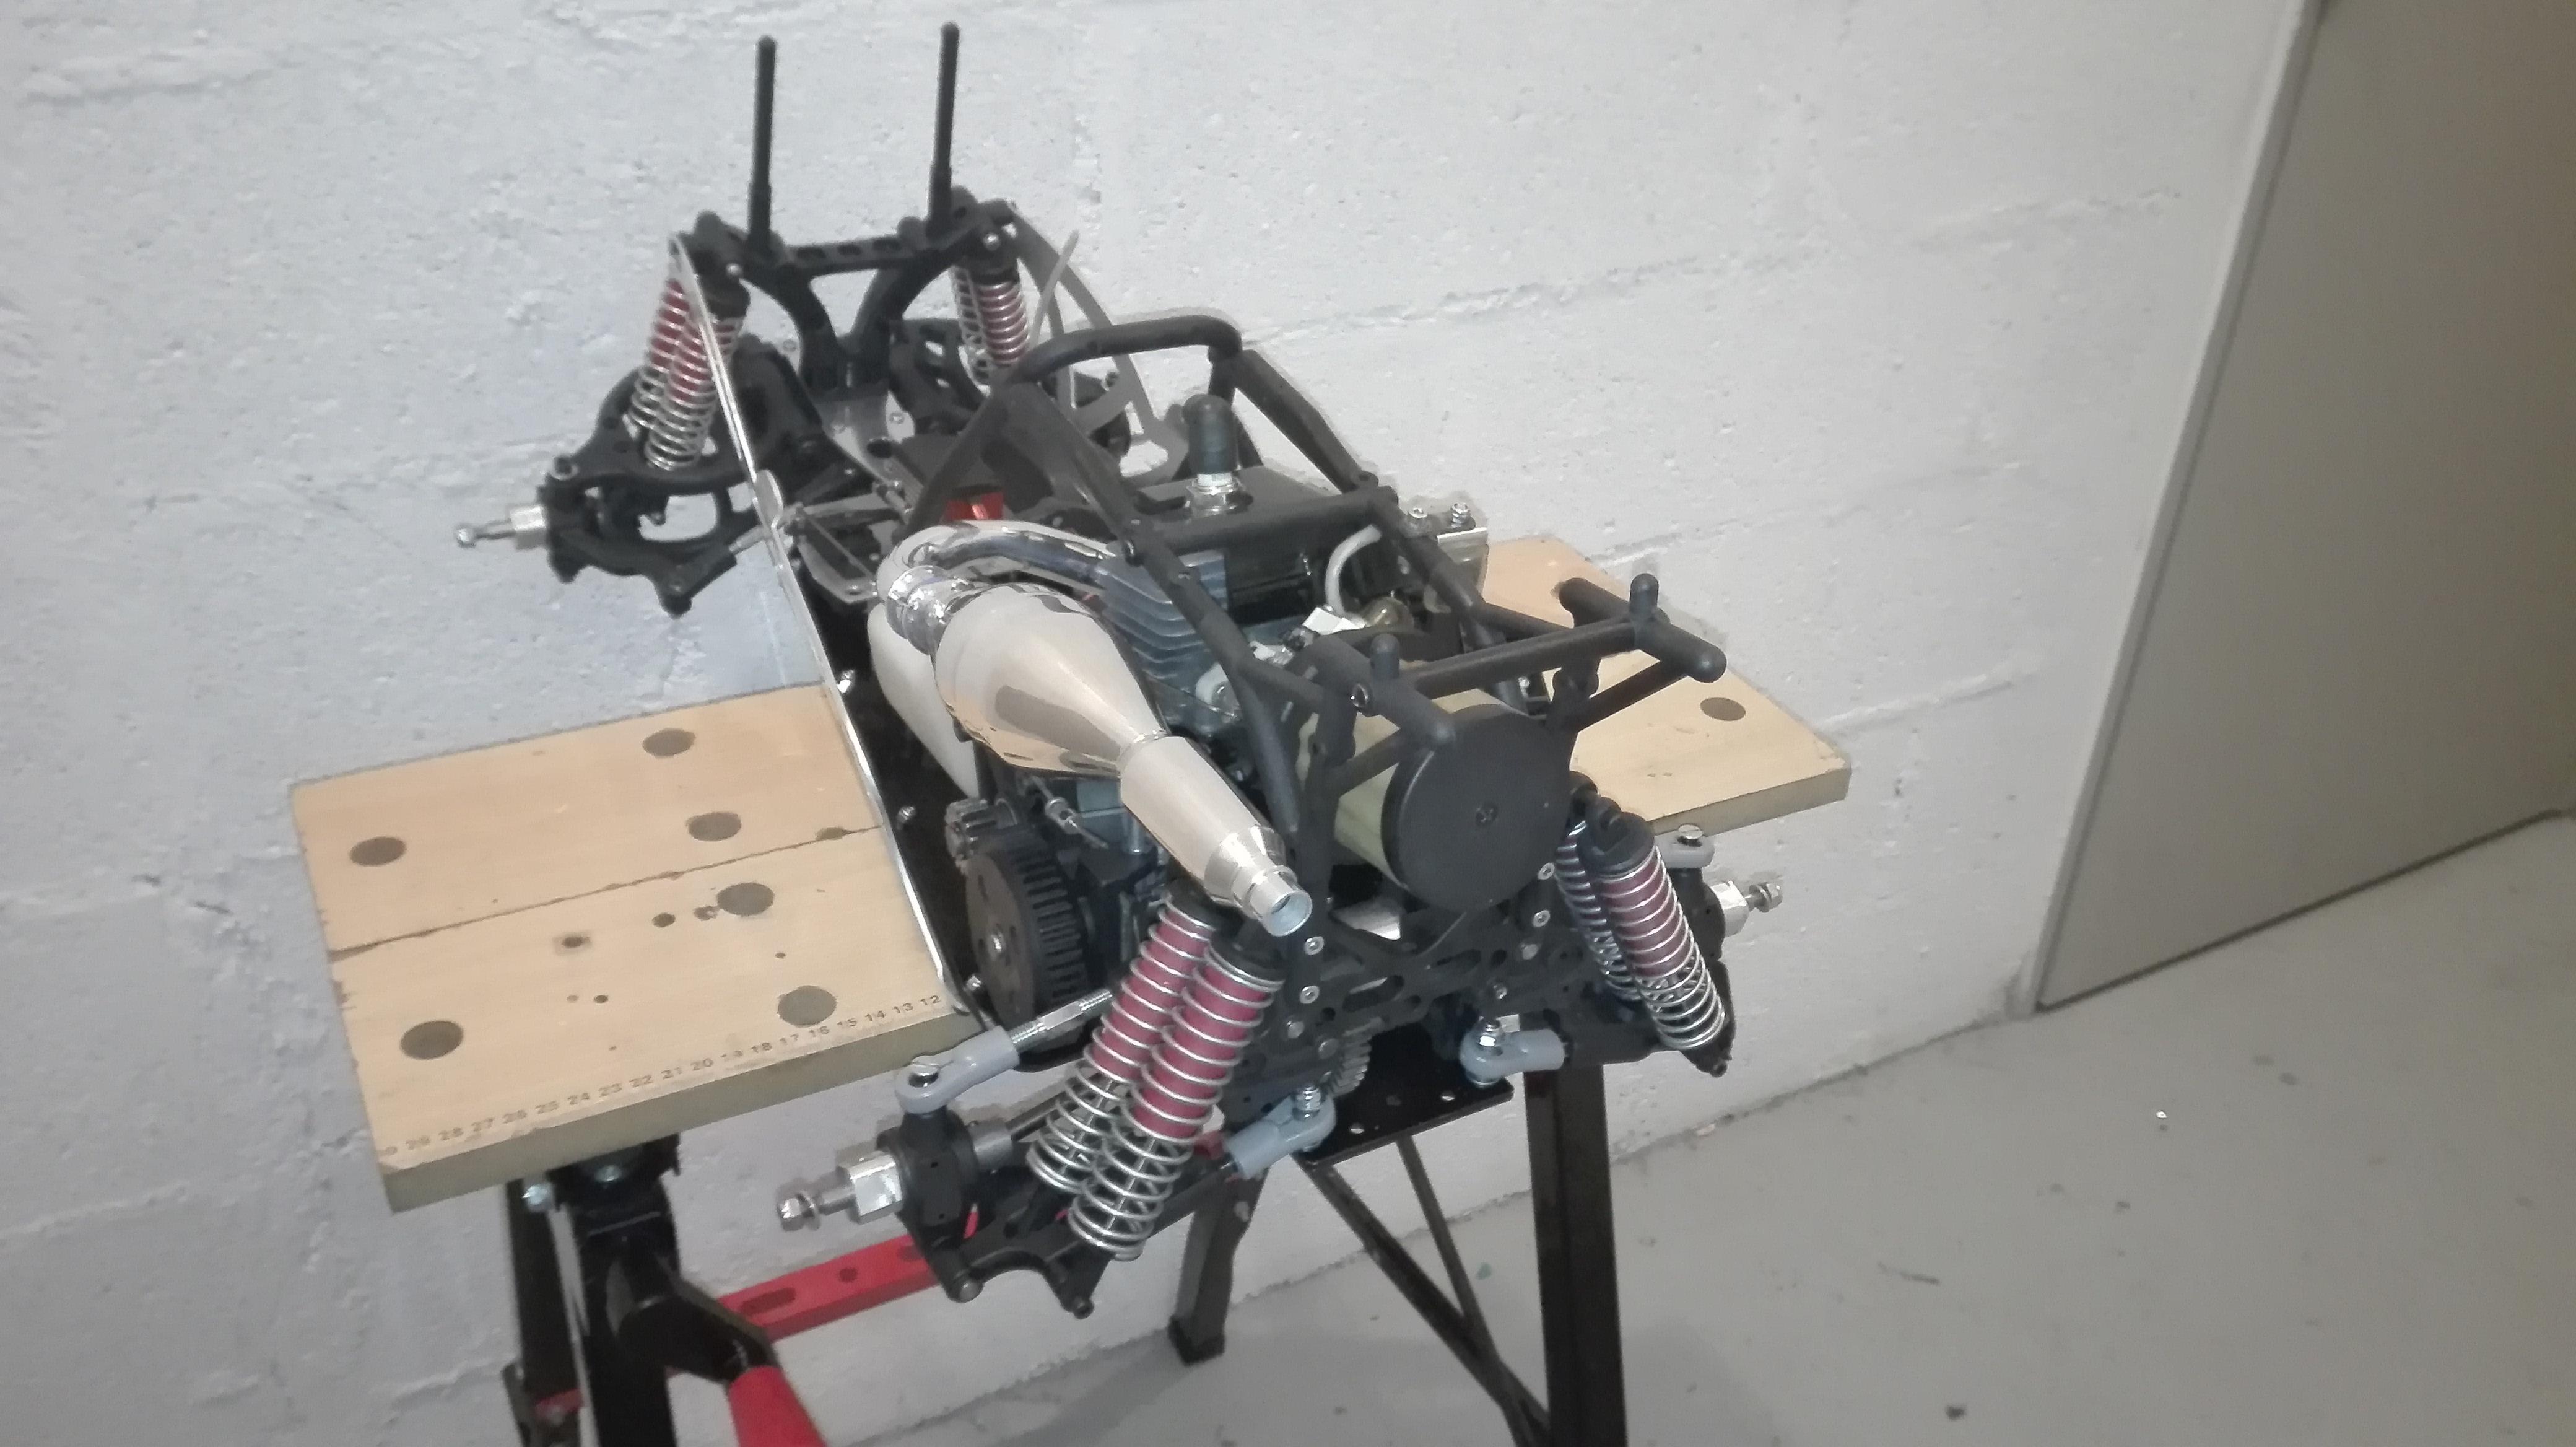 re-montage complet monster truck FG depuis un chassis nu - Page 2 180303061851270050